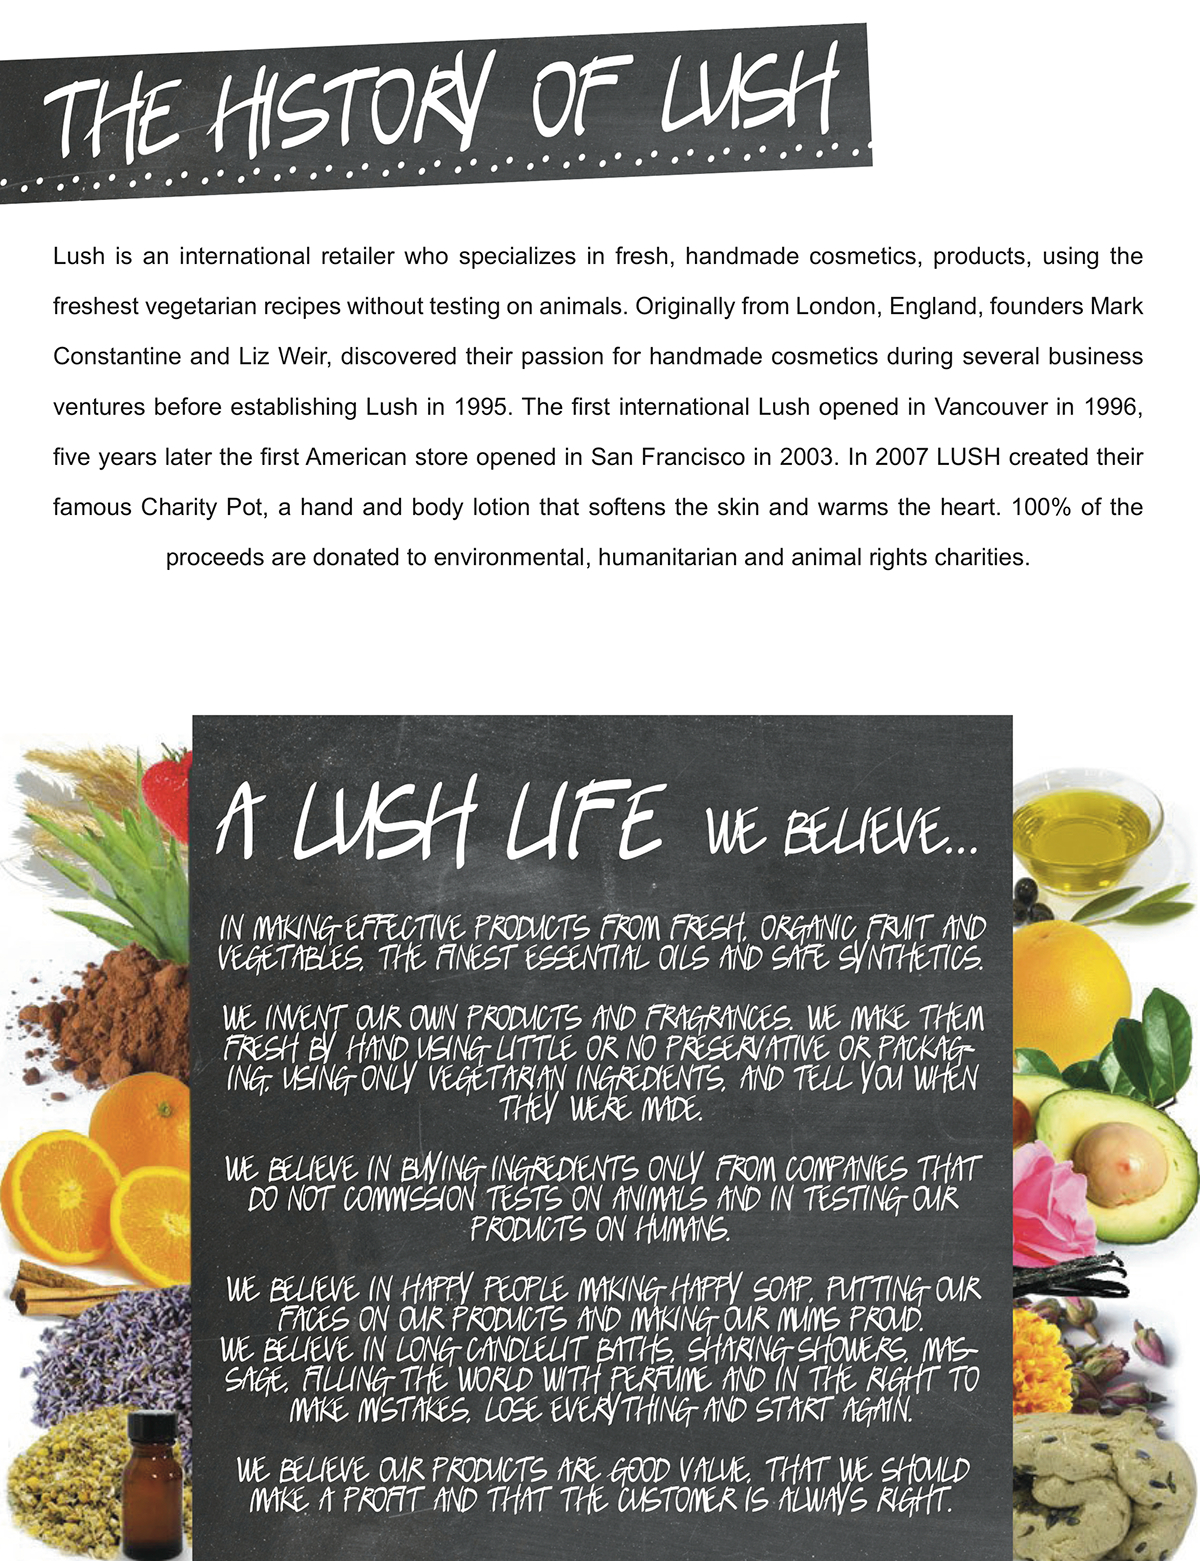 creative brief lush lush cosmetics cosmetics marketing   fashion marketing interactive design